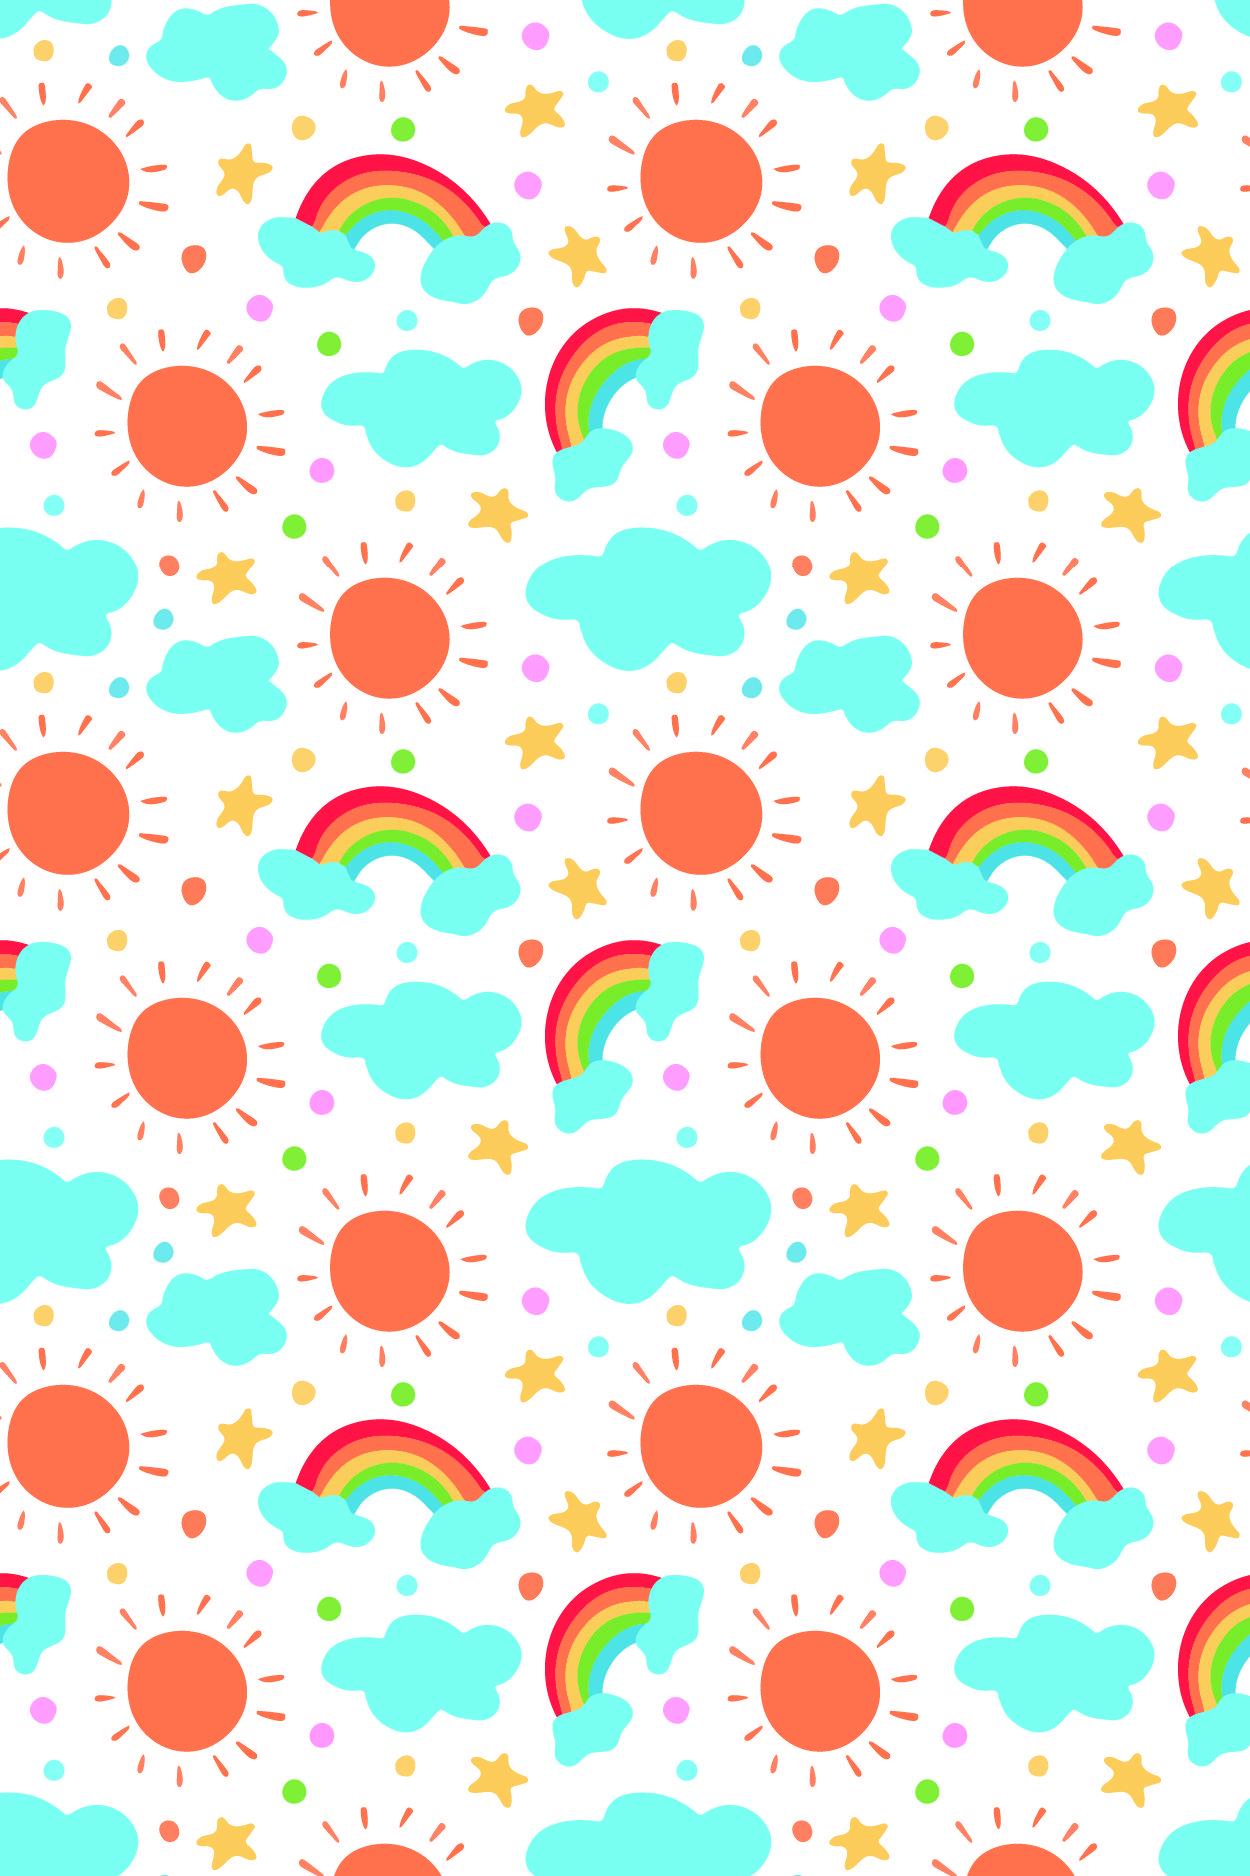 Rainbow Vibes Patter Rainbow Wallpaper Iphone Rainbow Wallpaper Cute Pastel Wallpaper